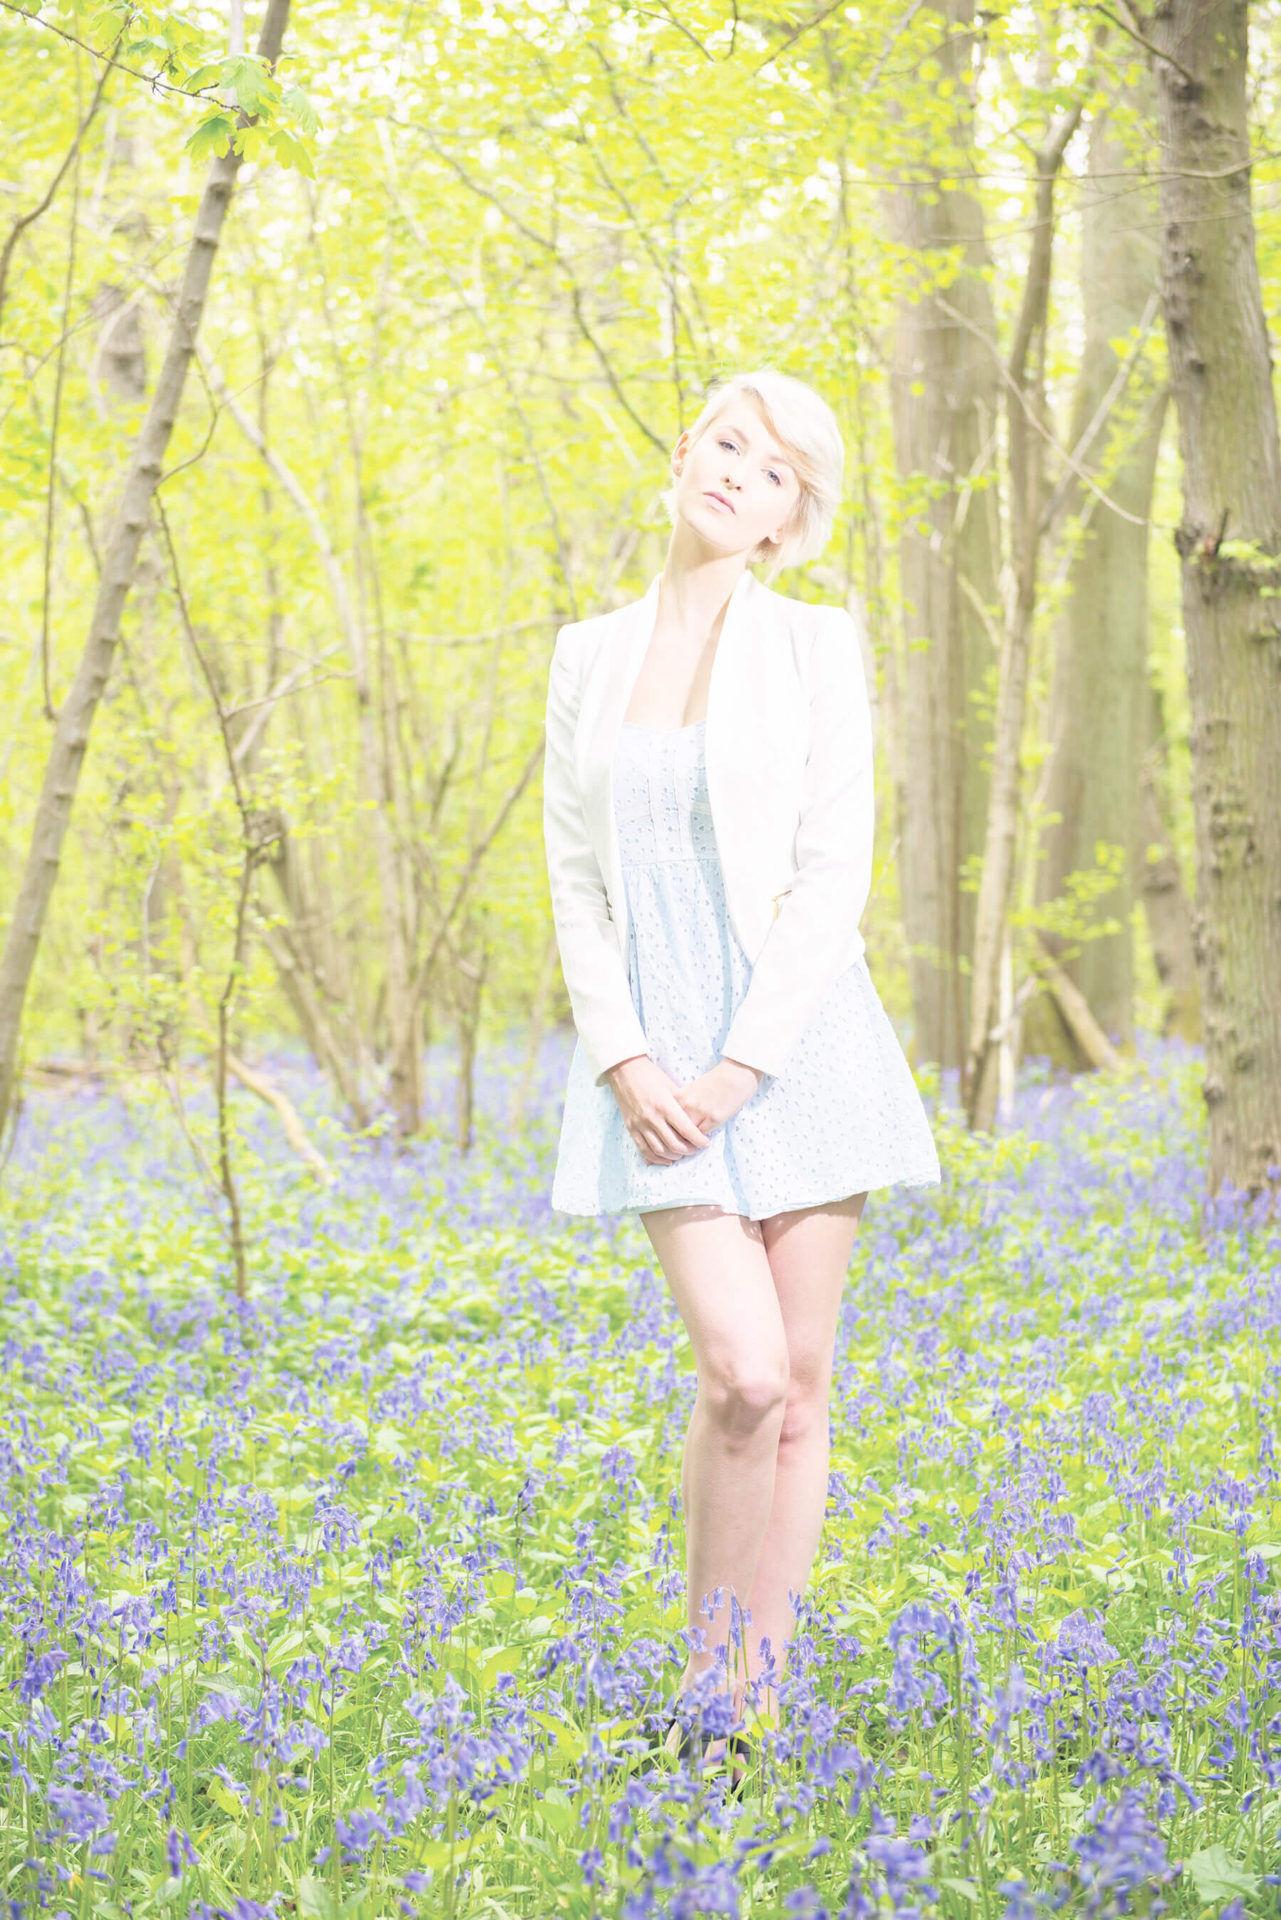 Basic photo editing: brightness